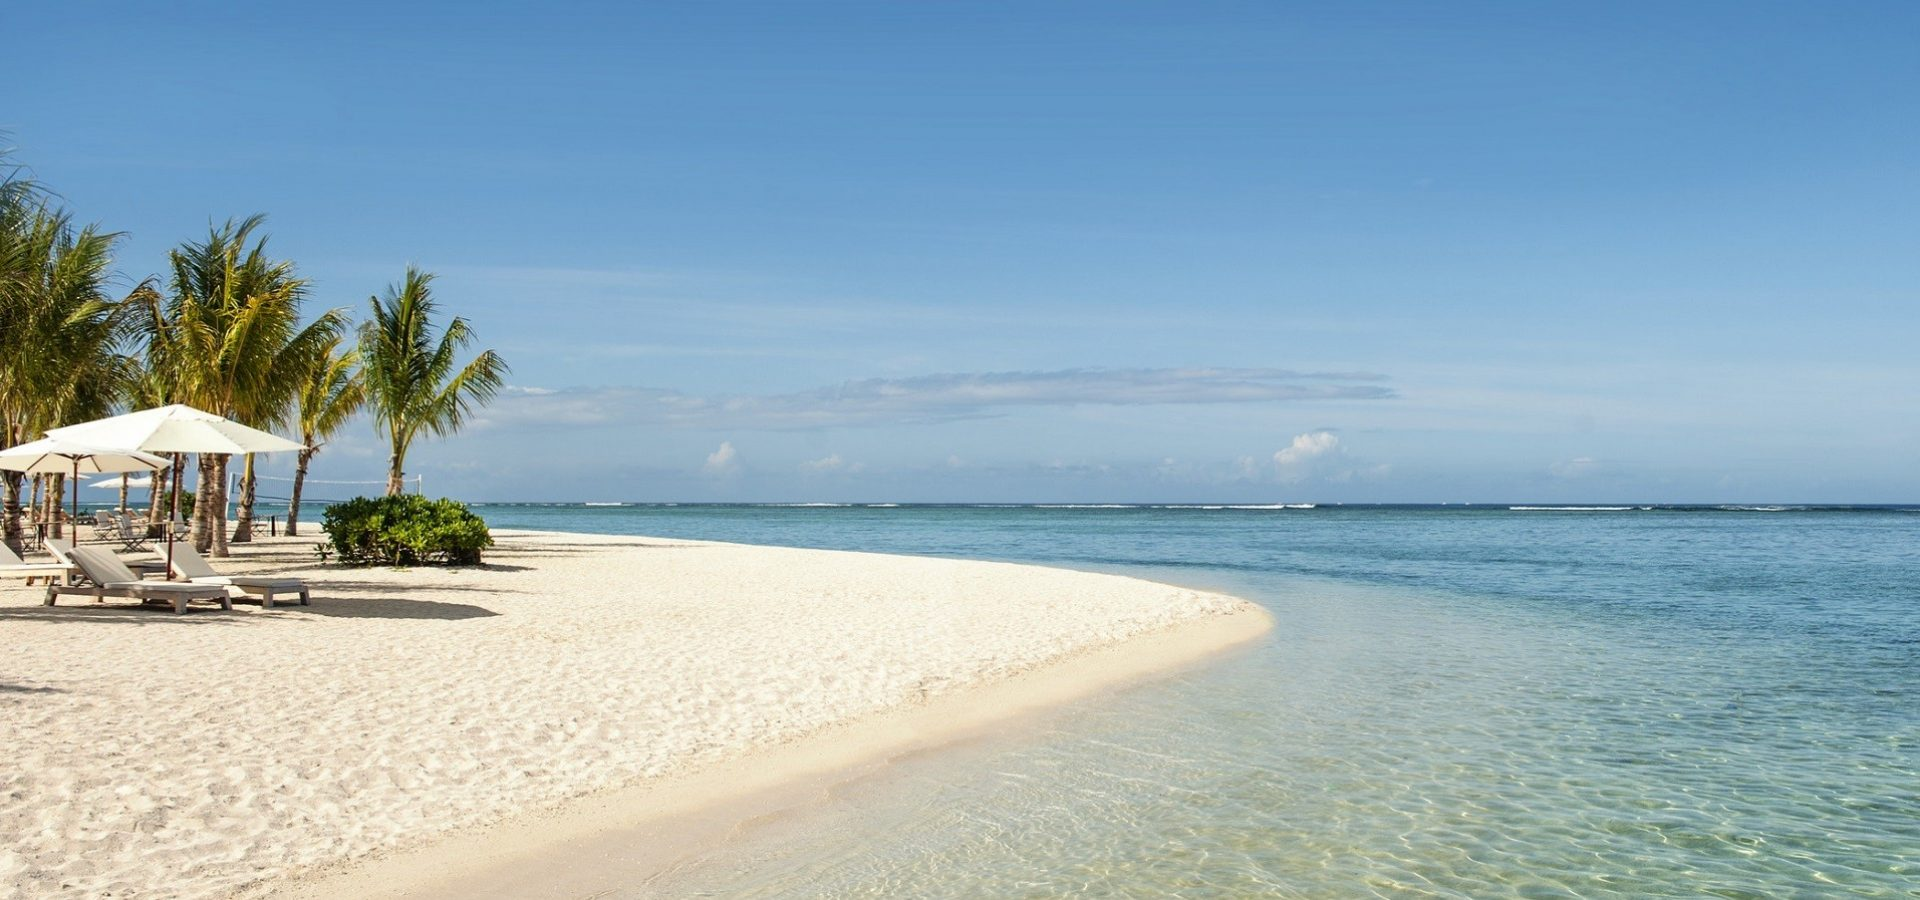 the-st-regis-mauritius-resort-6-906d1c47-e280-4ee8-843e-a652fe25577c